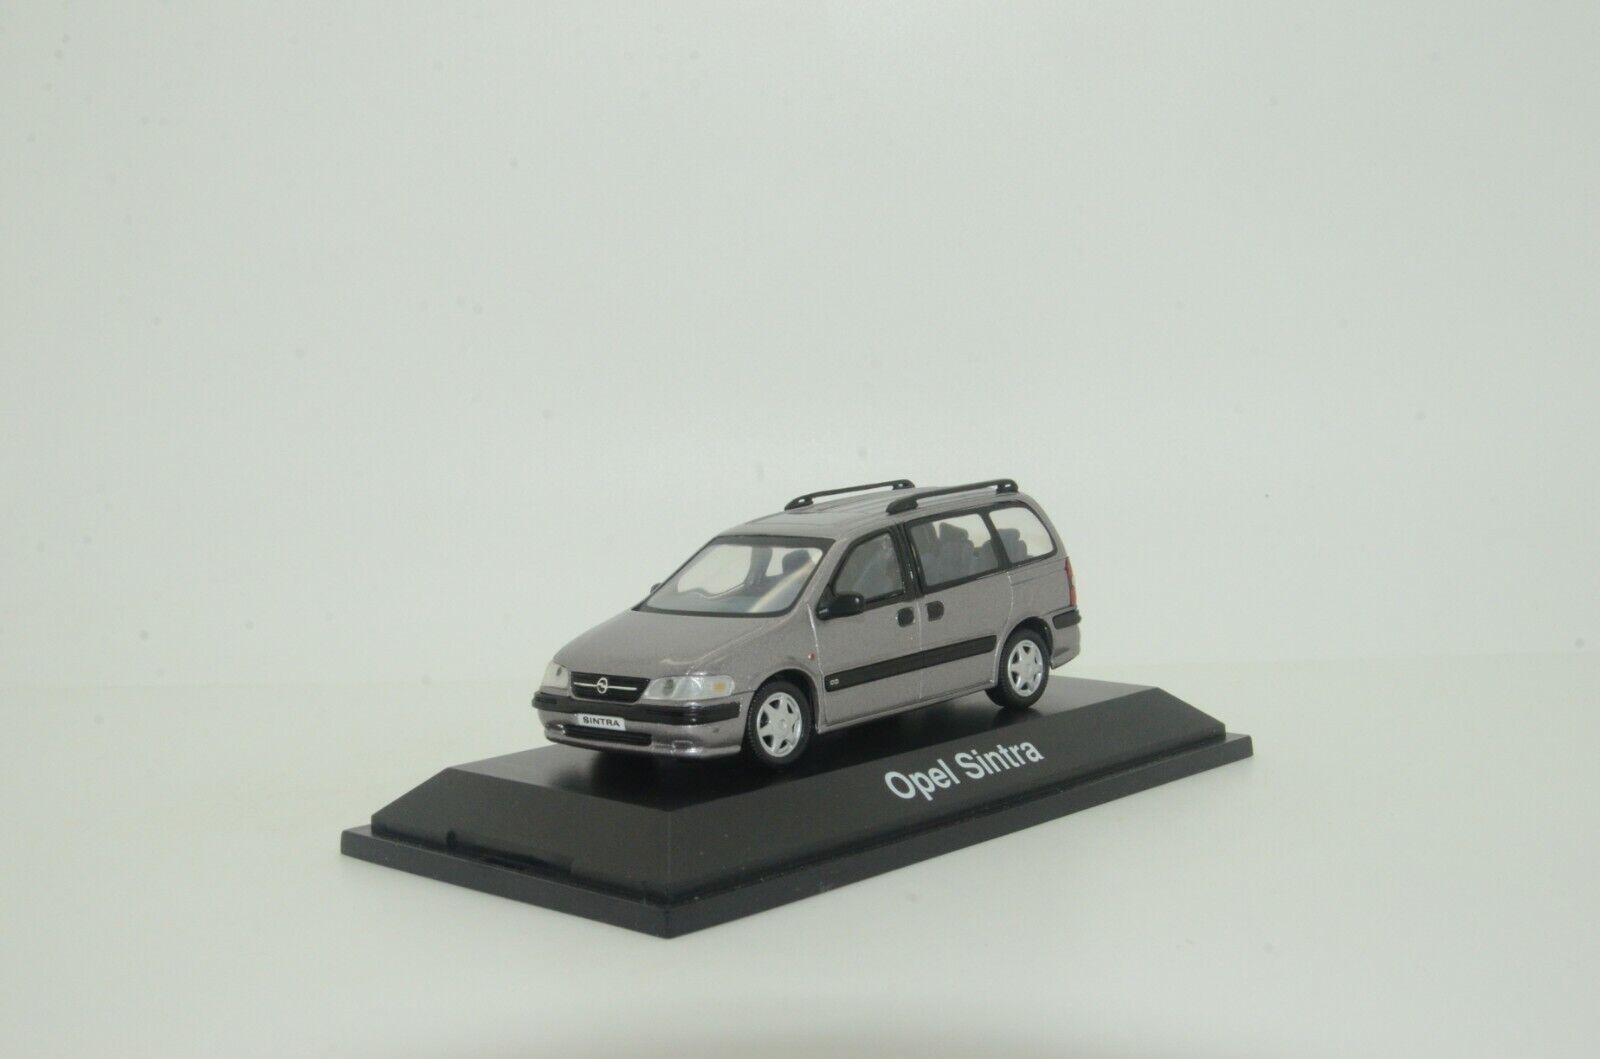 Opel Sintra Schuco 04292 1 43